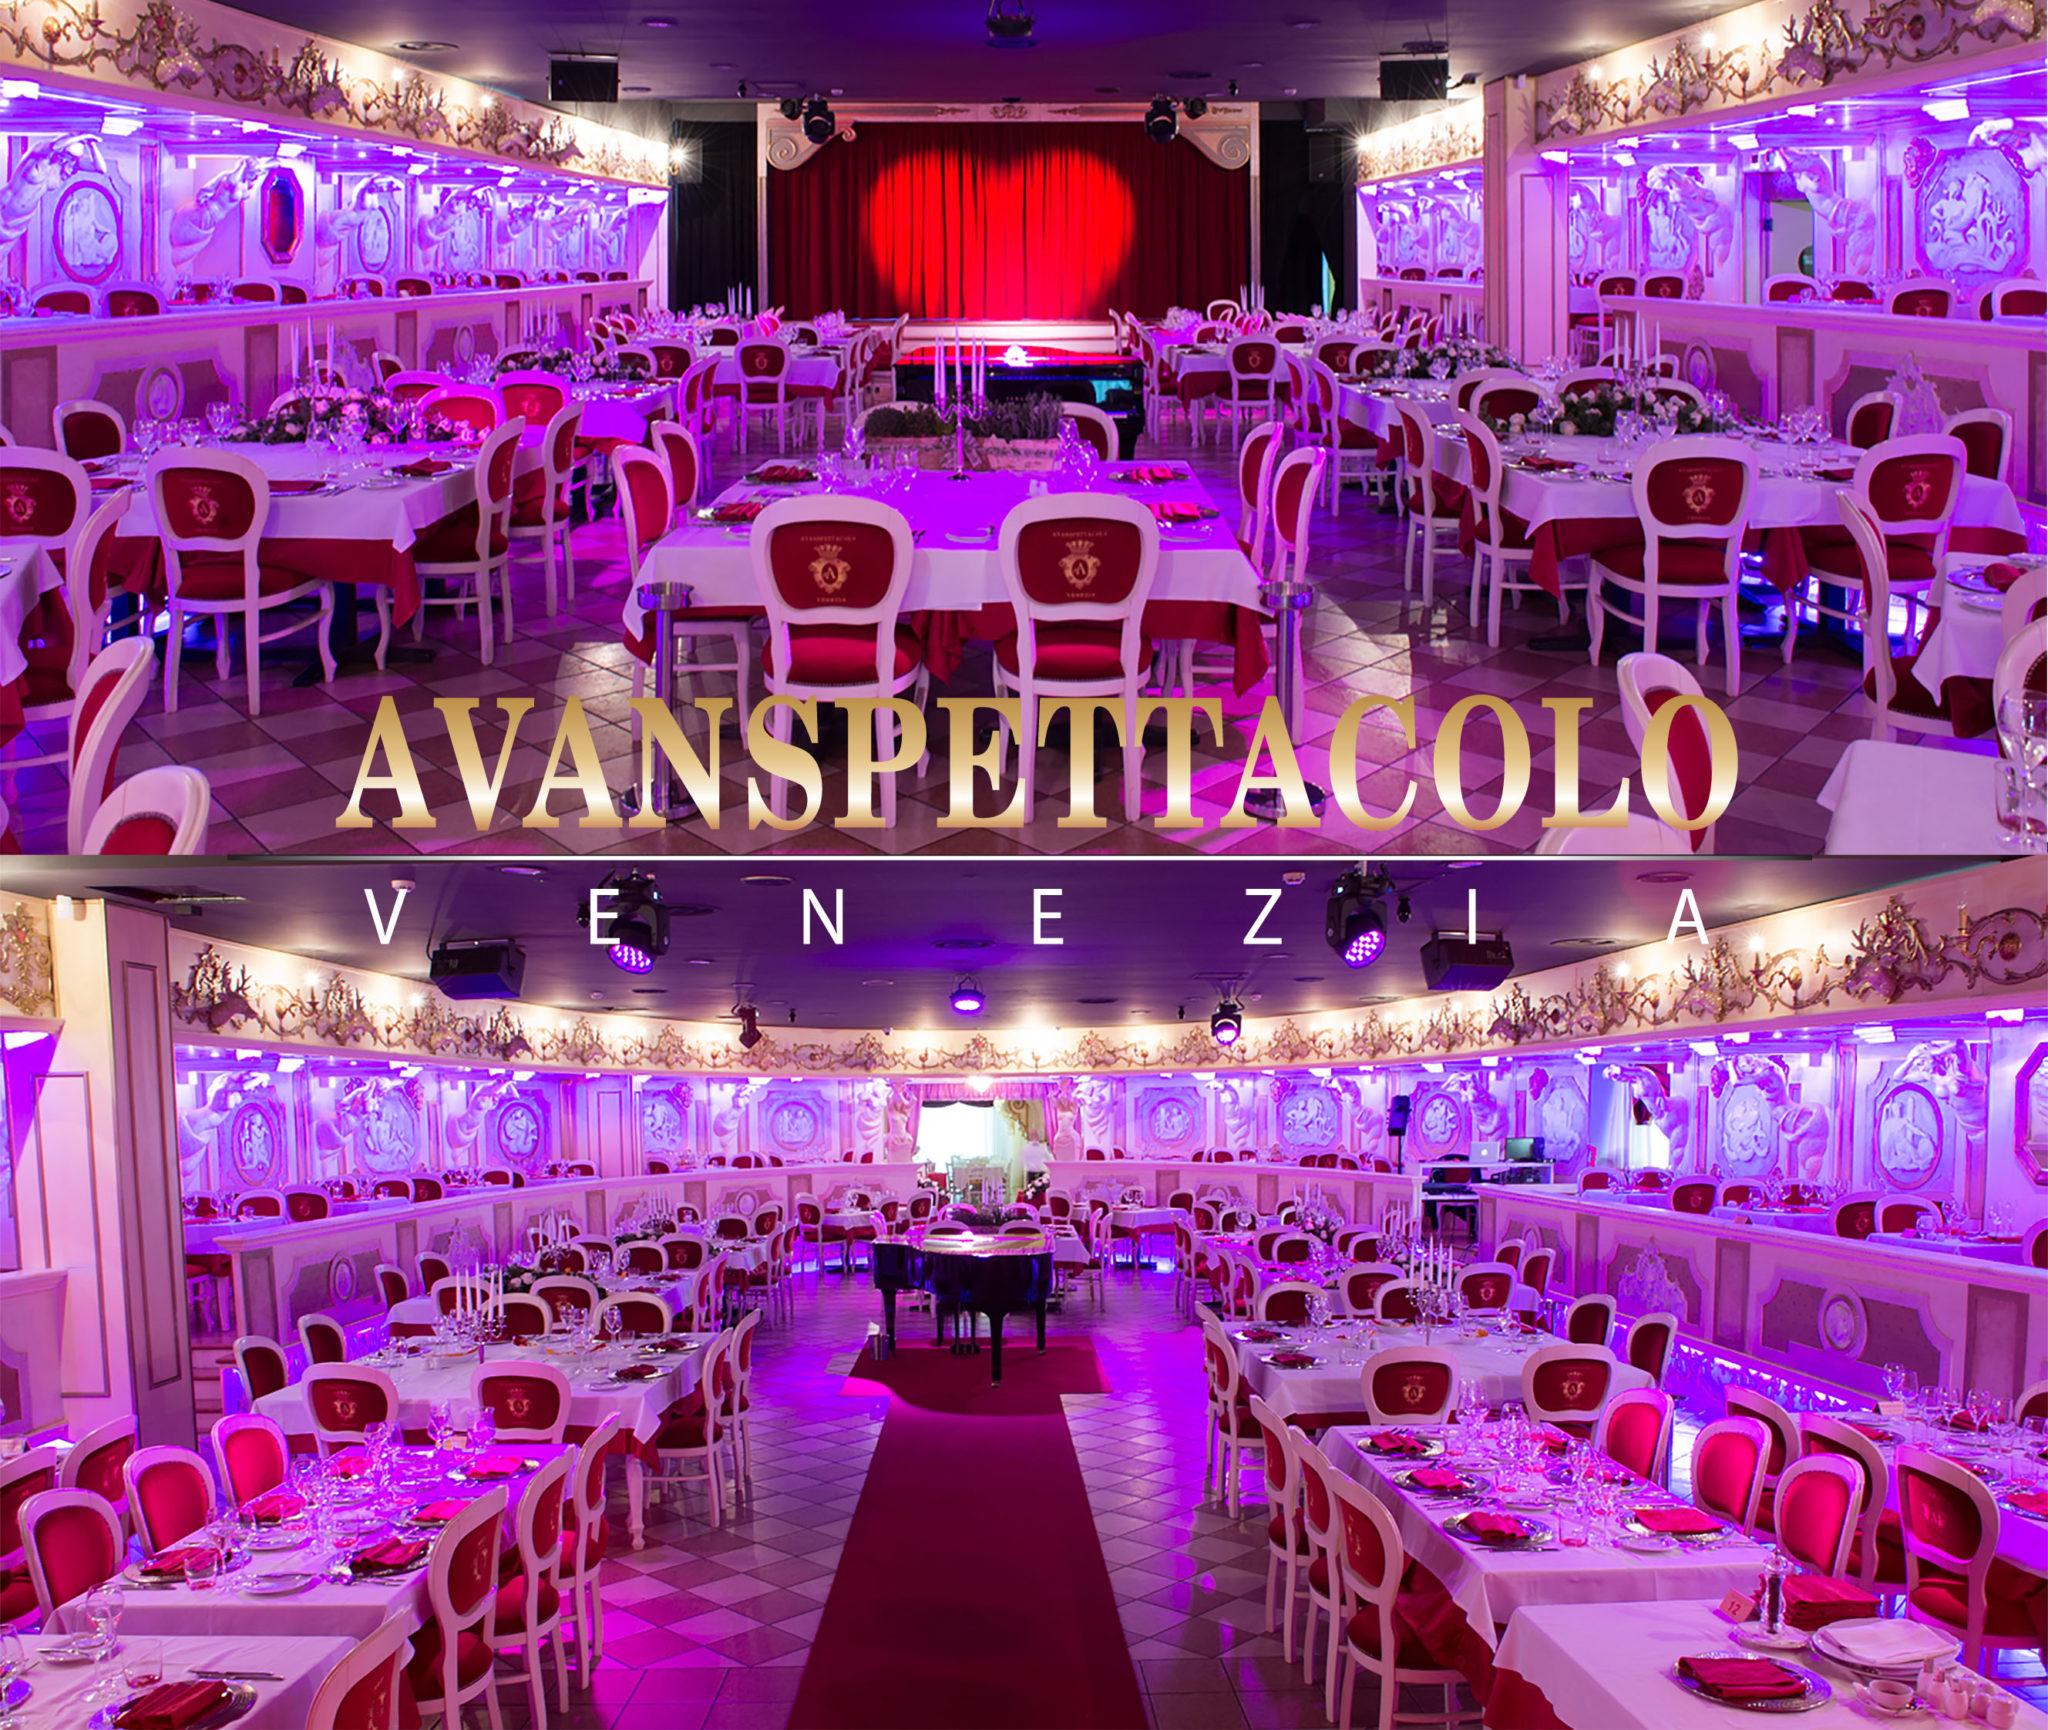 sala Grand Show Magic Avanspettacolo Venezia 1